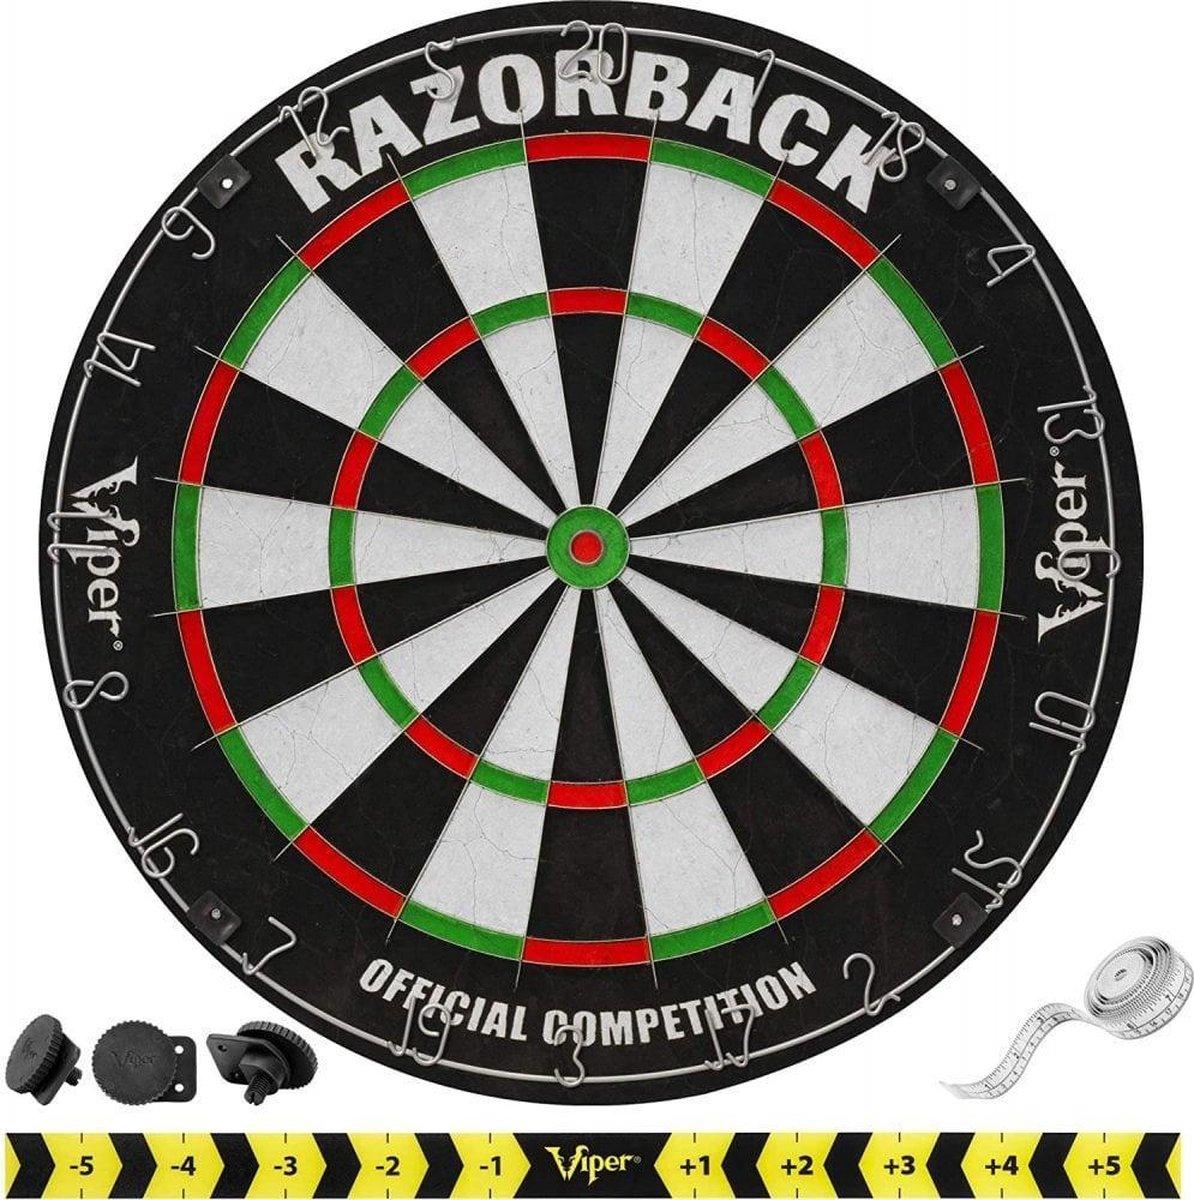 Viper Razorback Dartbord